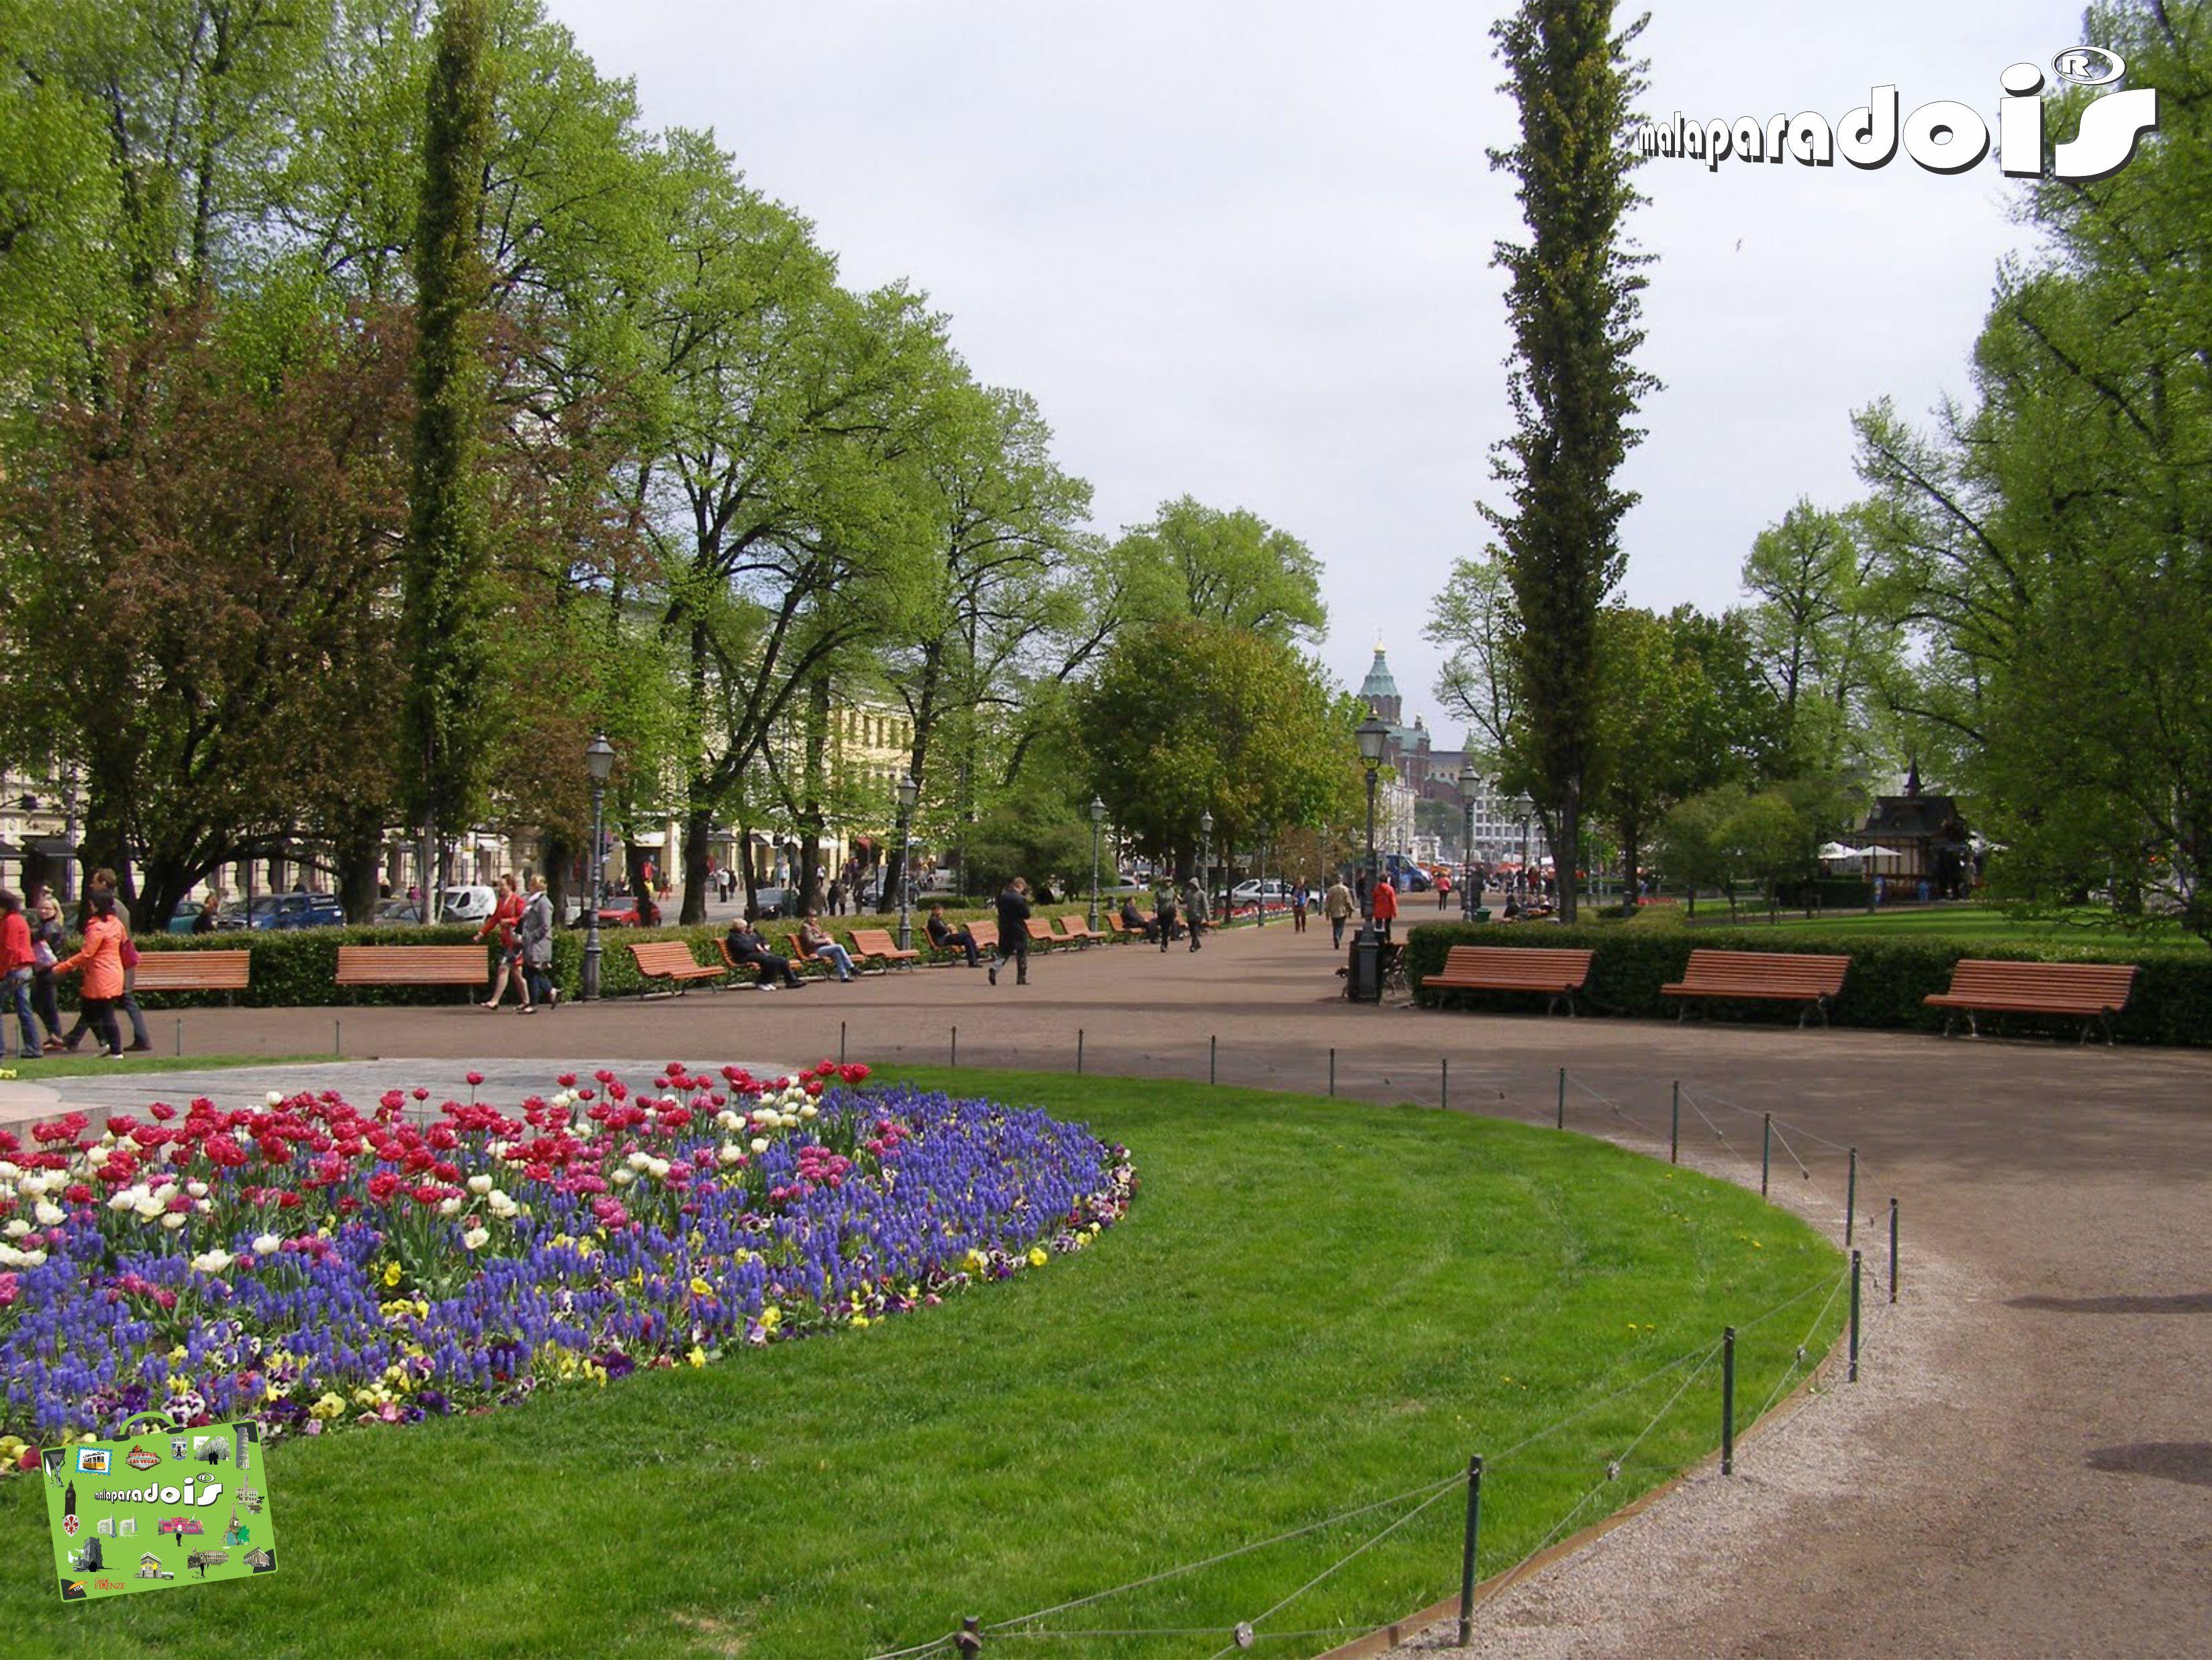 Helsinki Parque Esplanadi